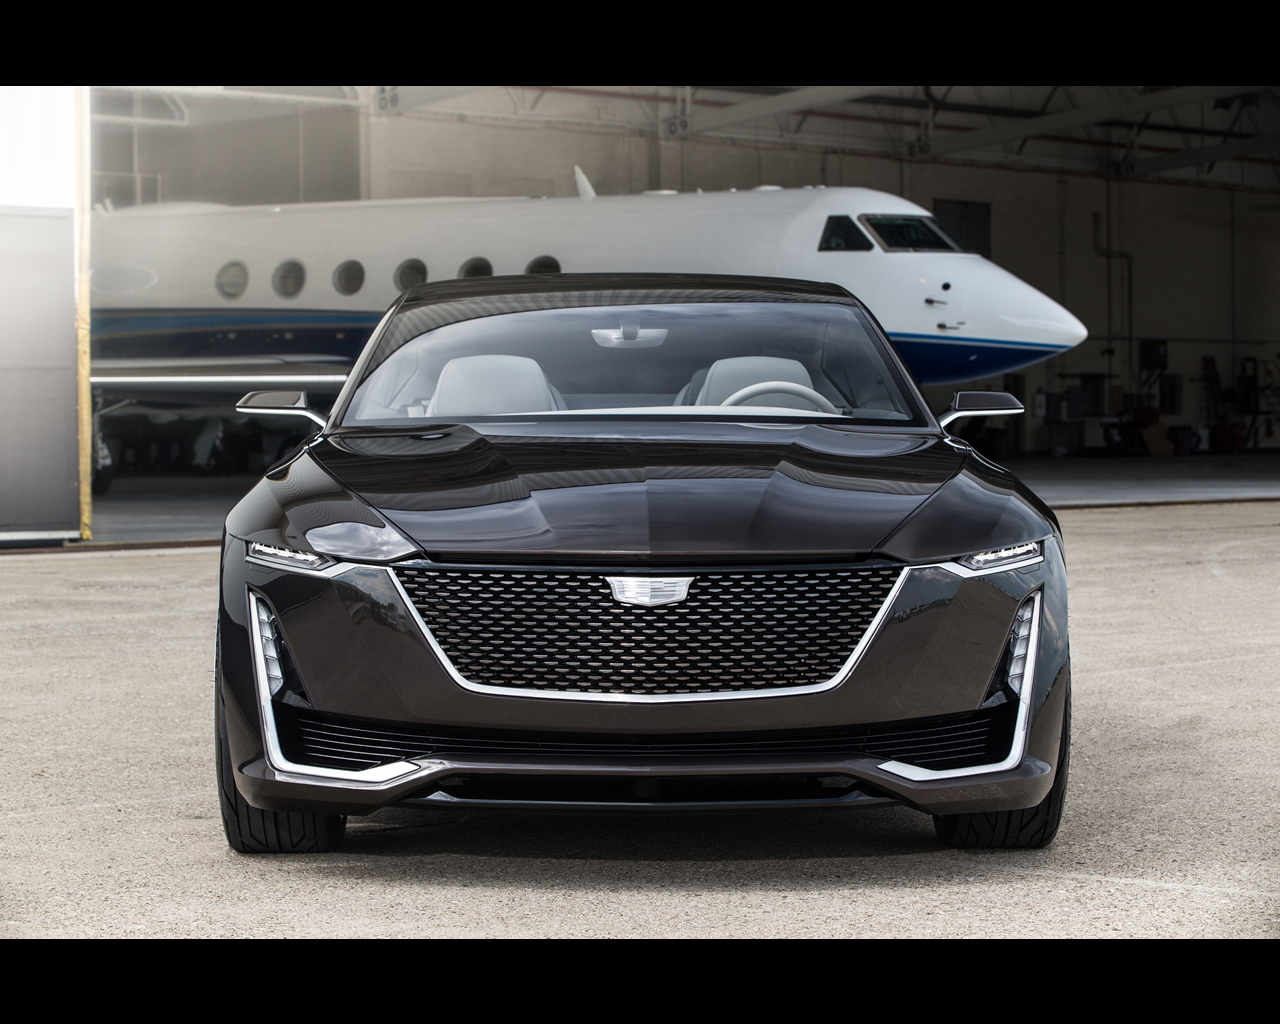 Covert Gmc Austin >> Covert Cadillac Used Cars | Upcomingcarshq.com